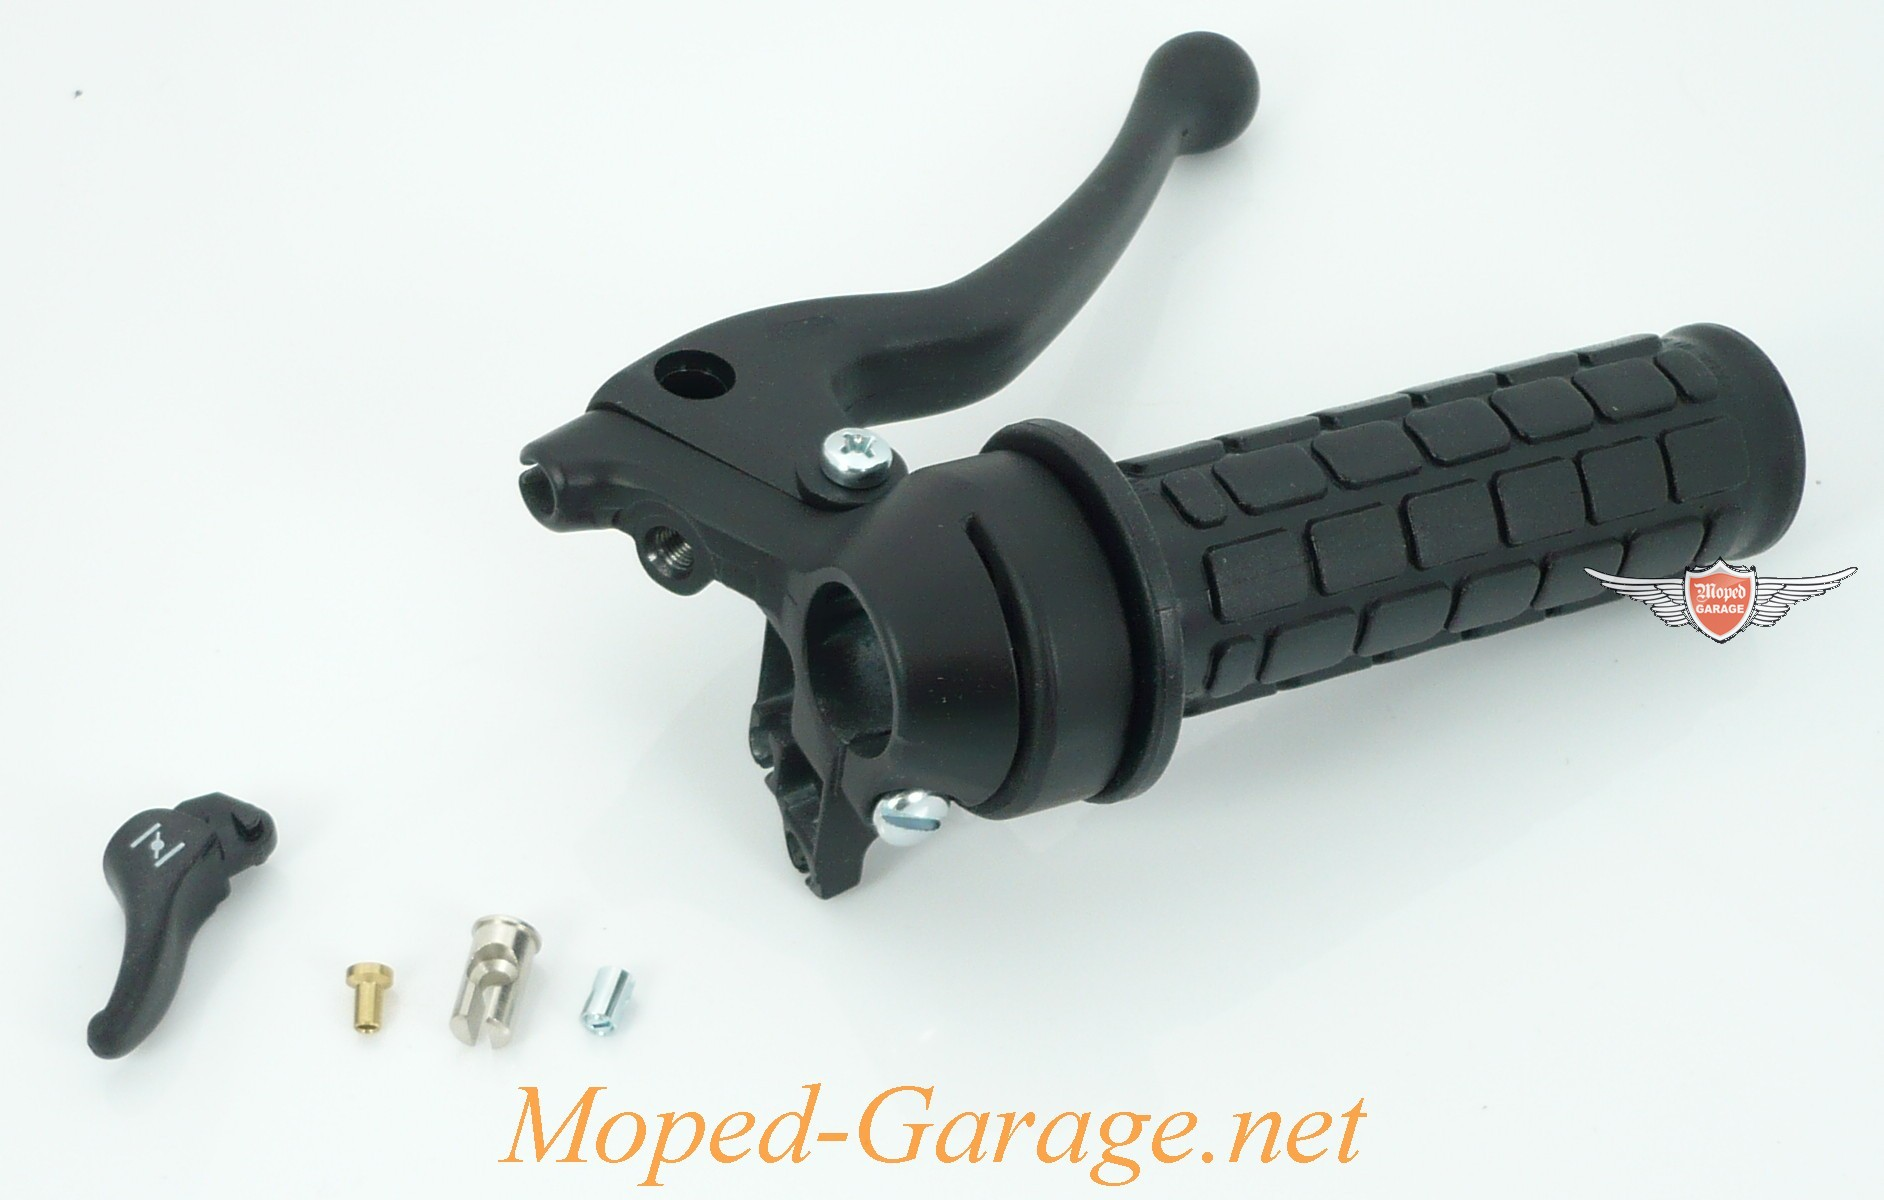 Moped Garage Net Magura Gasgriff Hercules Prima 5 Gt Gx